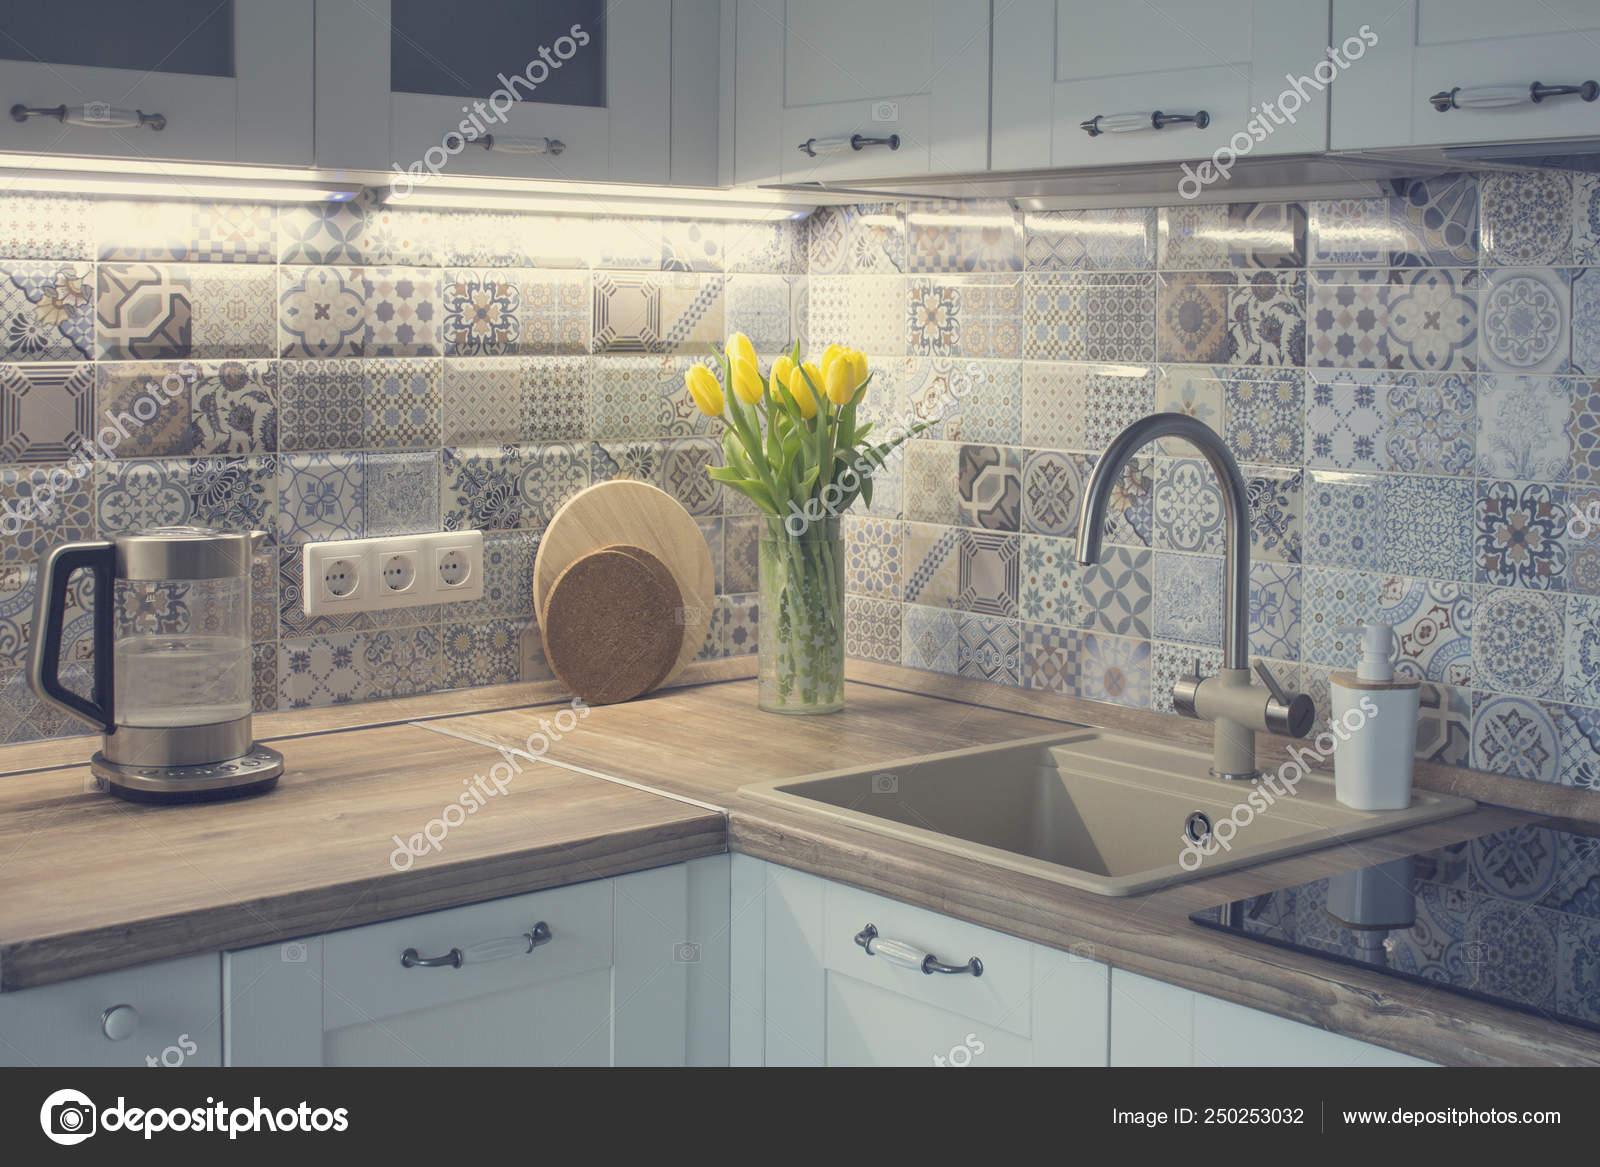 Cucina Bianca Con Piastrelle Patchwork — Foto Stock ...